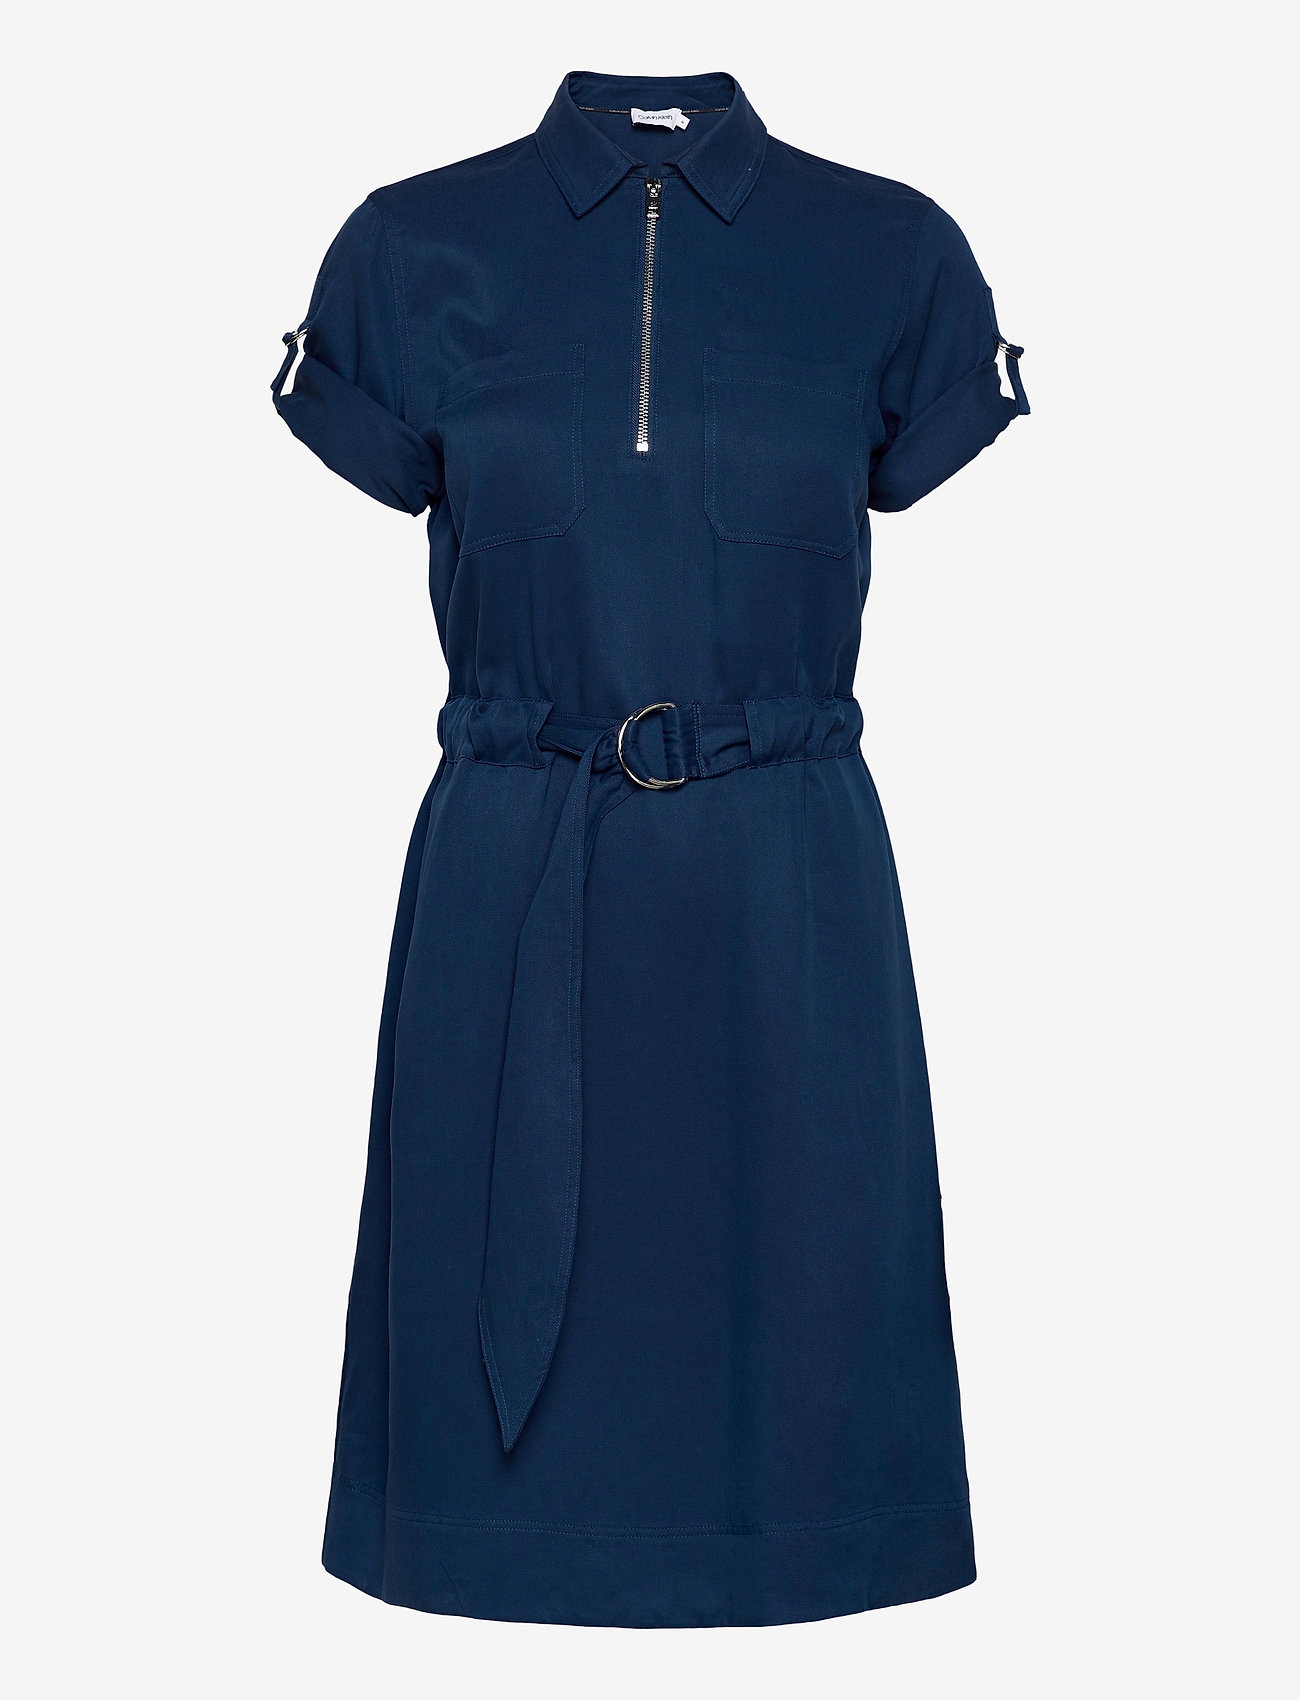 Tencel 3/4 Slv Zip Up Mini Dress (Blue Jean) (1700 kr) - Calvin Klein